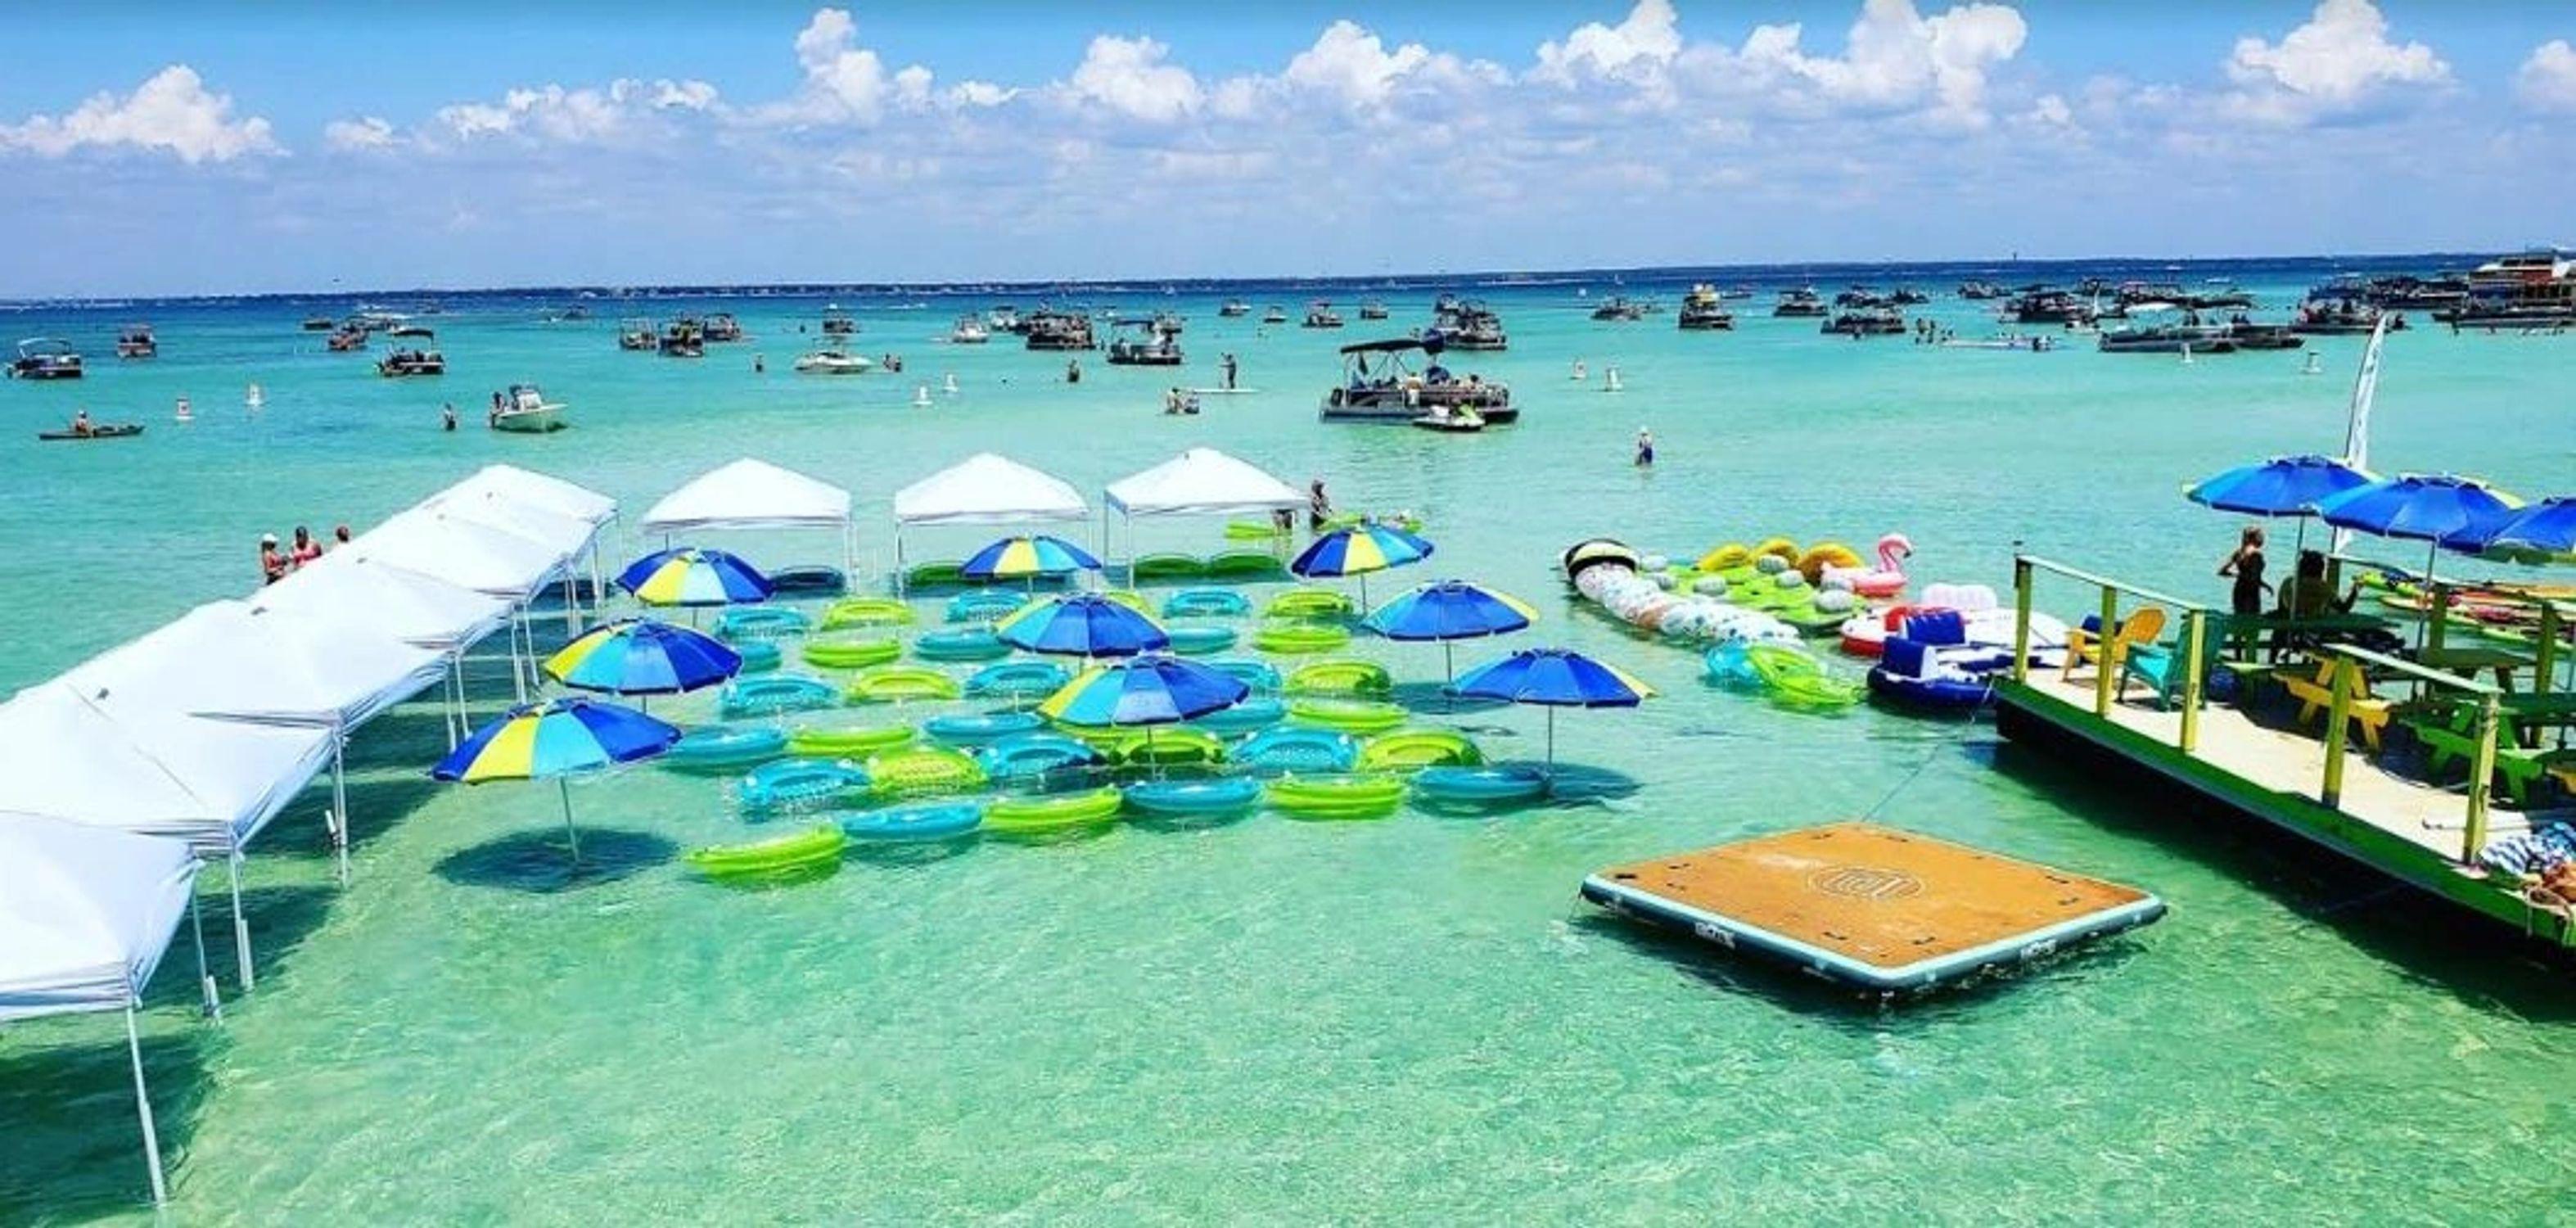 Crab Island Water Taxi 2019 Panama city beach vacation